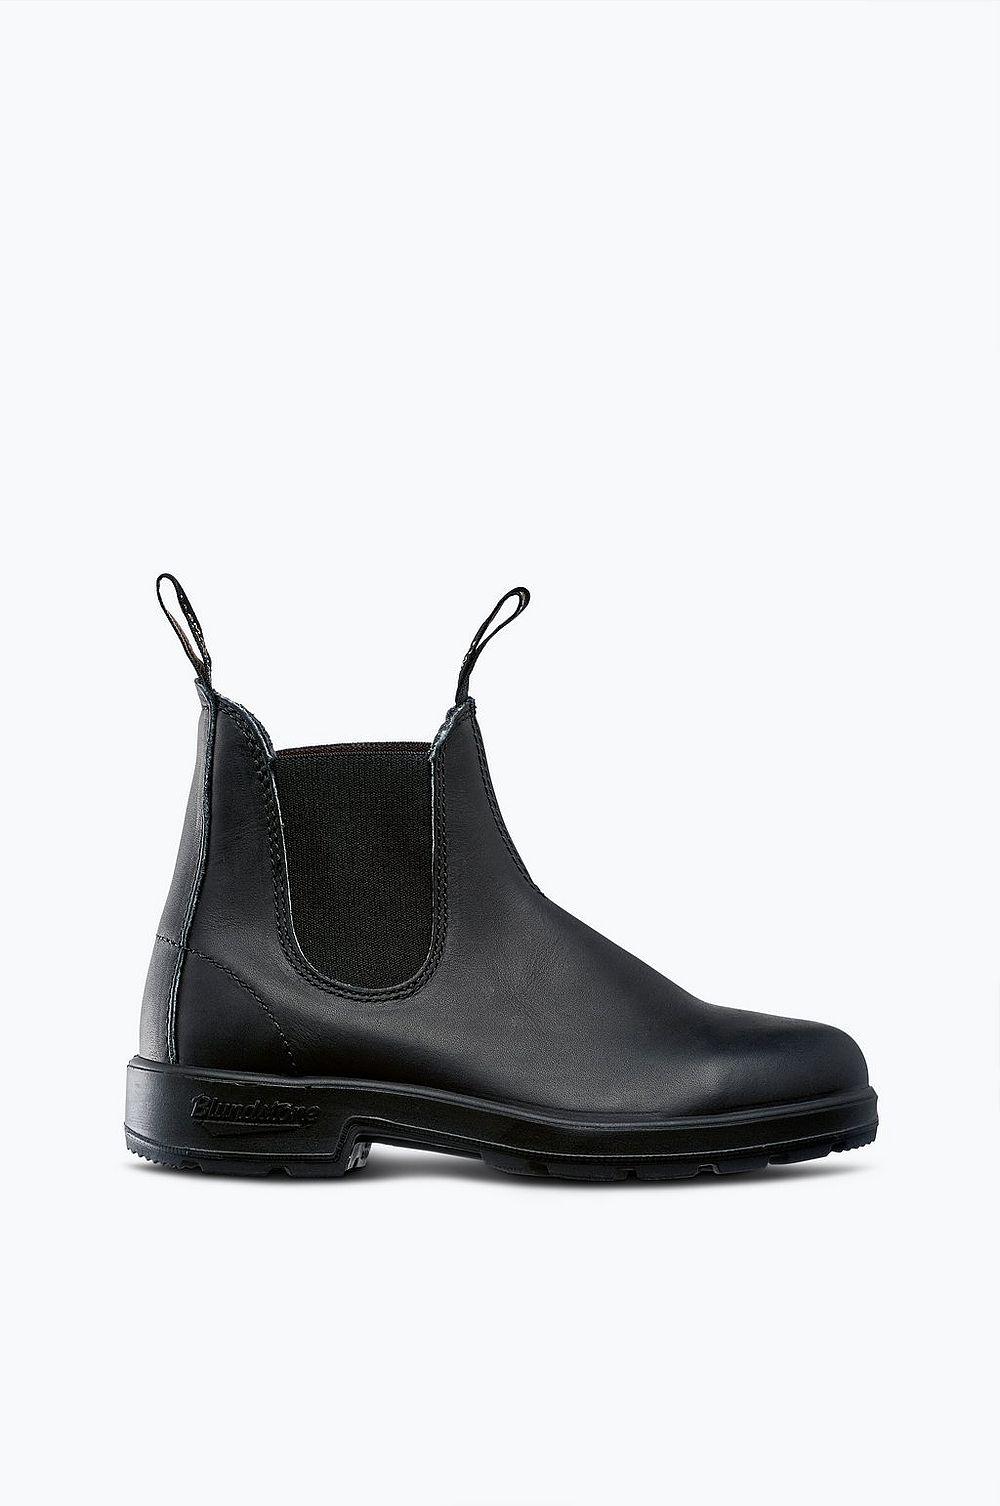 00fc1095bb4 Blundstone Chelsea-boots Classic 500 - Sort - Herre - Ellos.dk